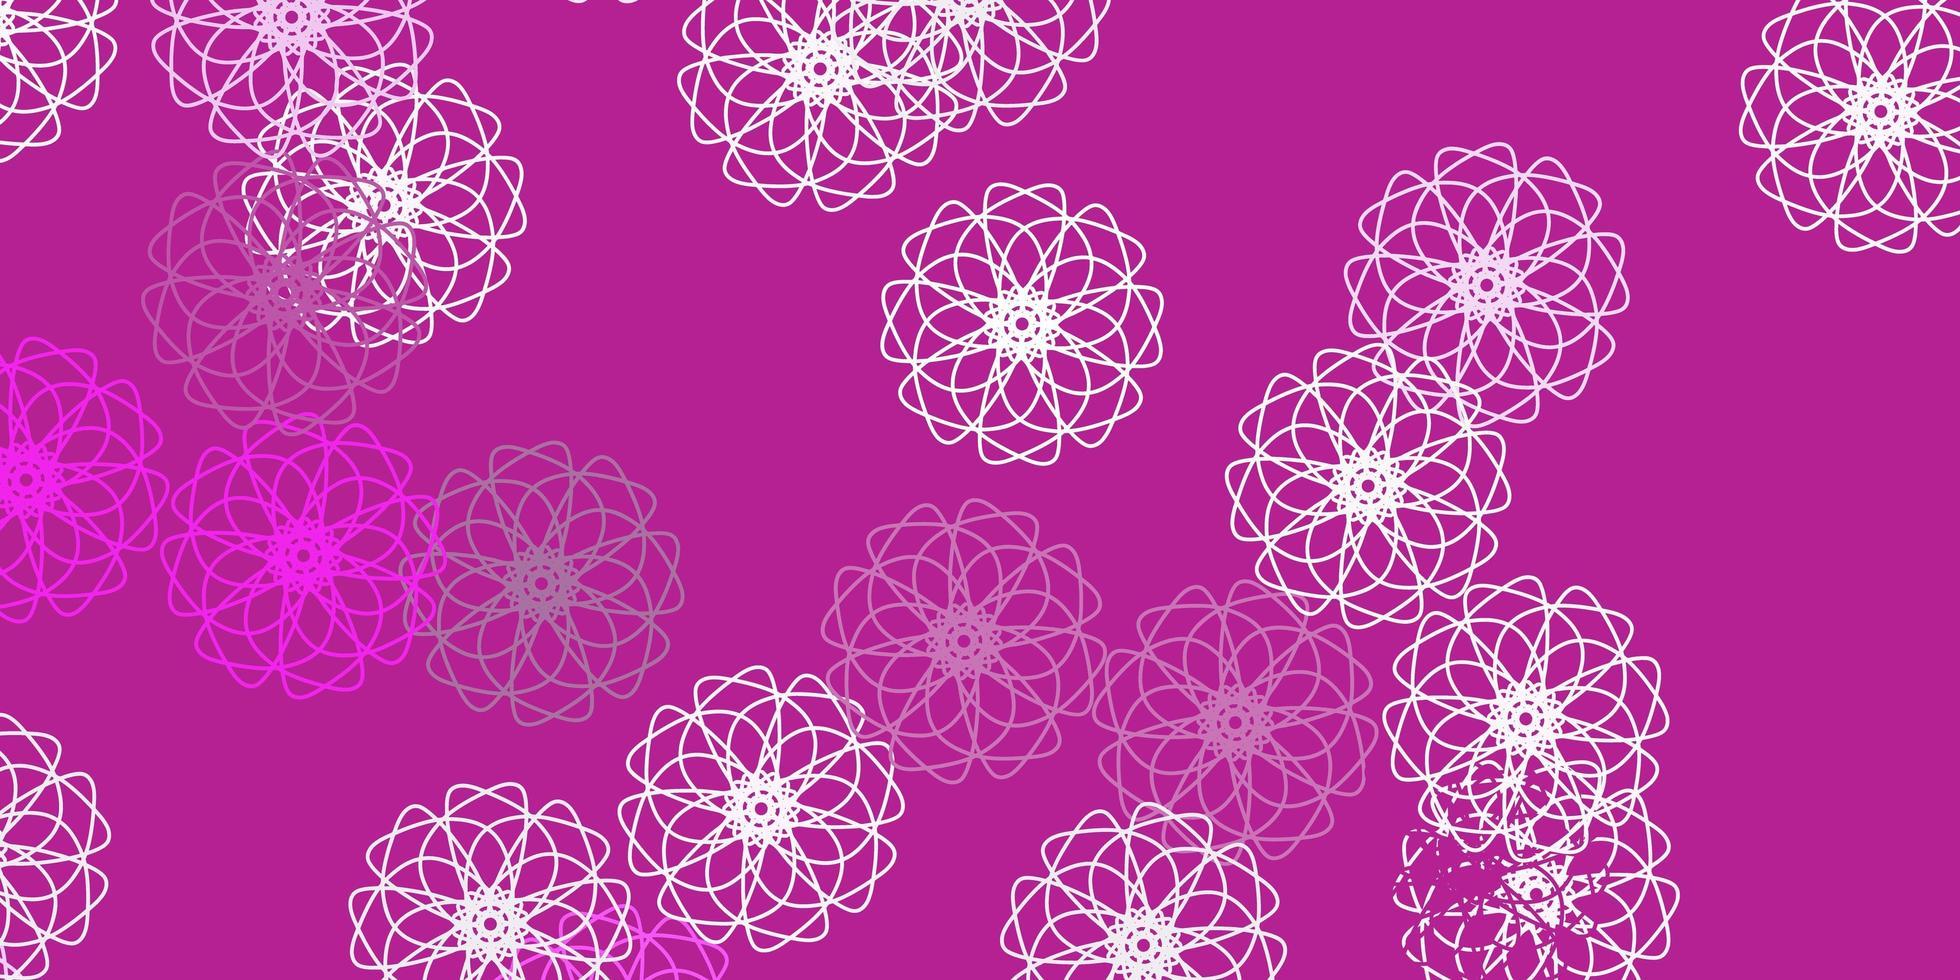 ljusrosa vektor naturlig bakgrund med blommor.